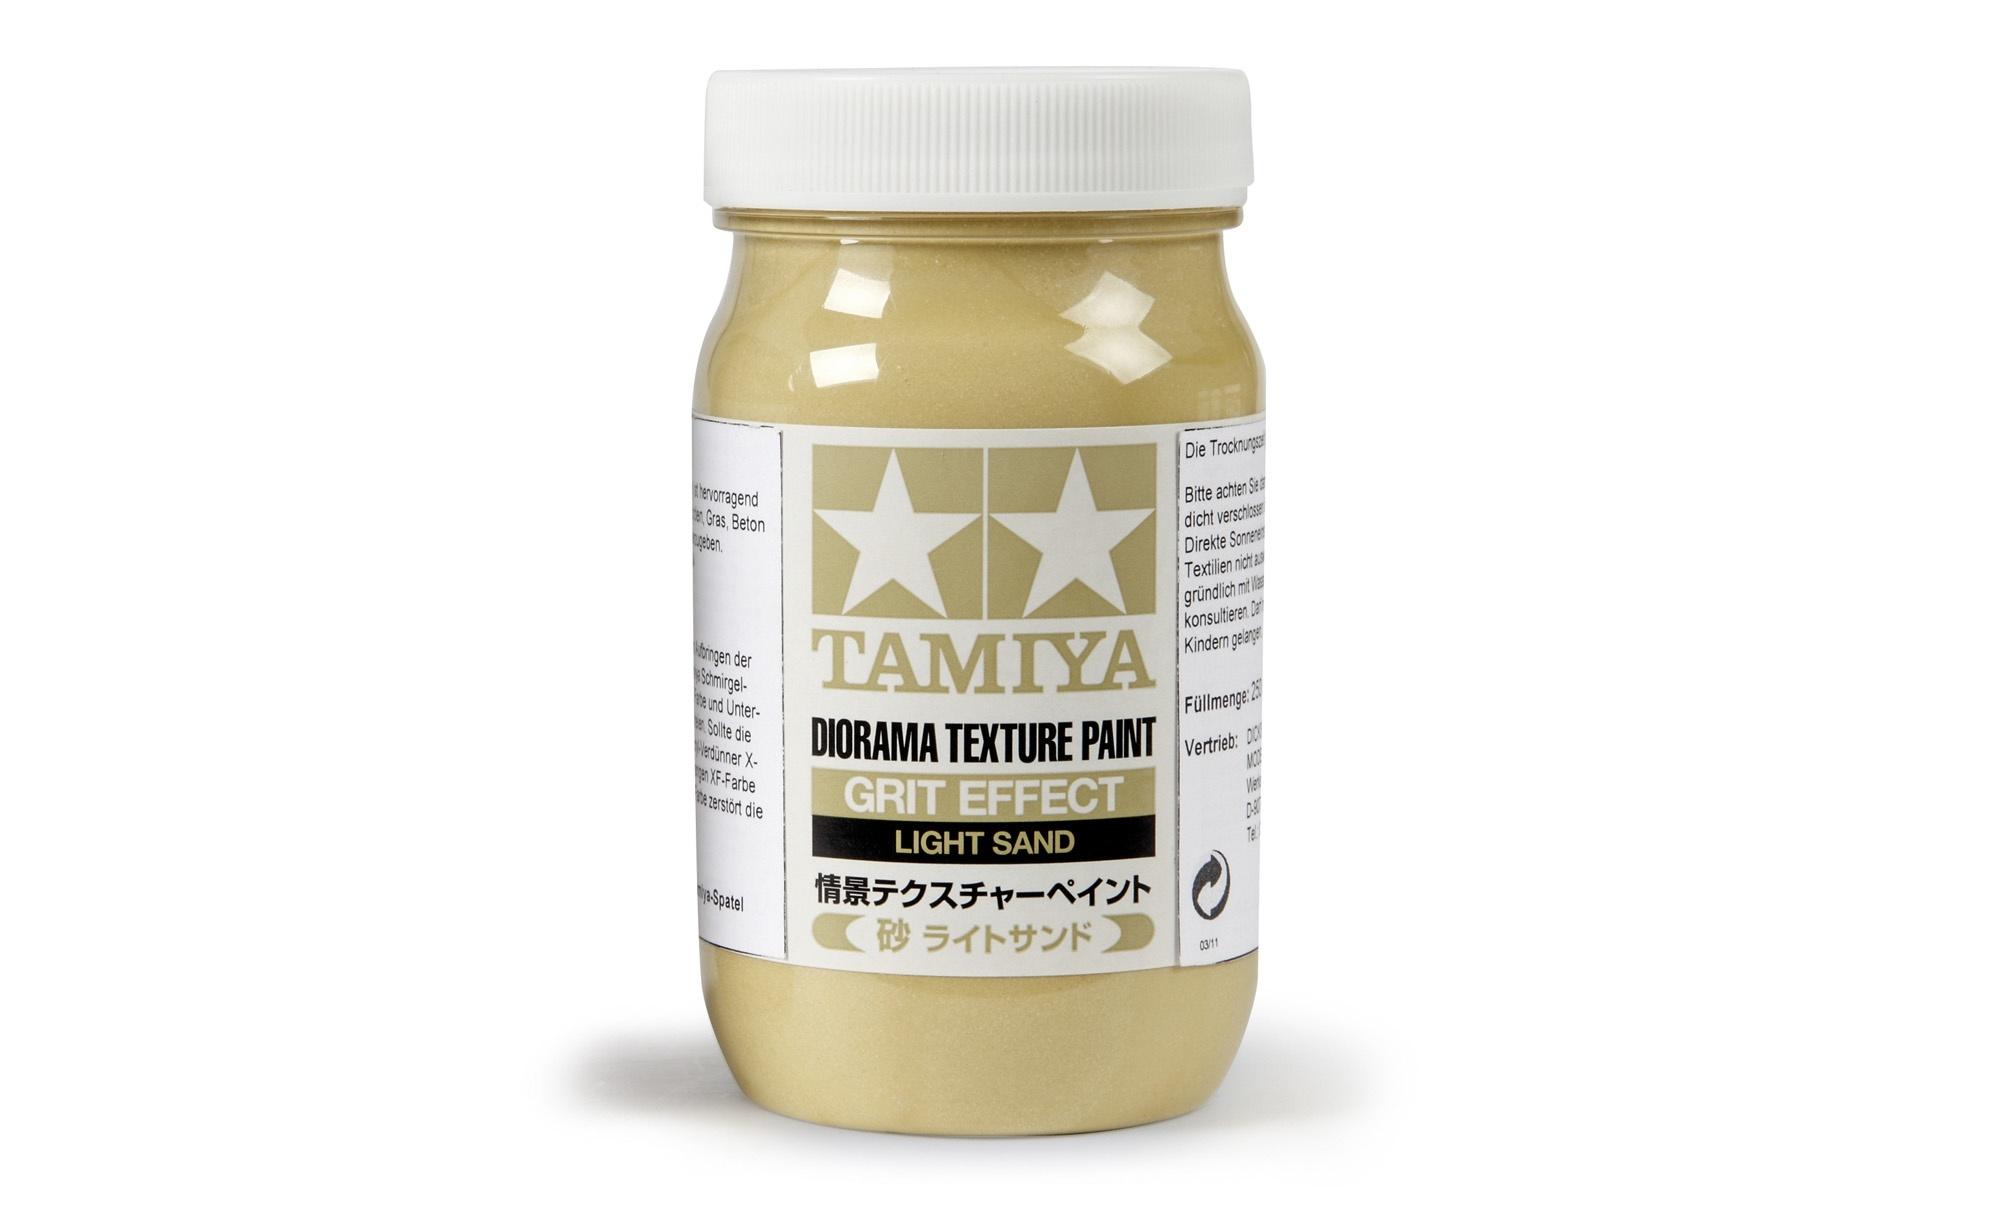 Tamiya Diorama Texture Paint - Grit Effect, Light Sand - 250ml - Tamiya - TAM87122